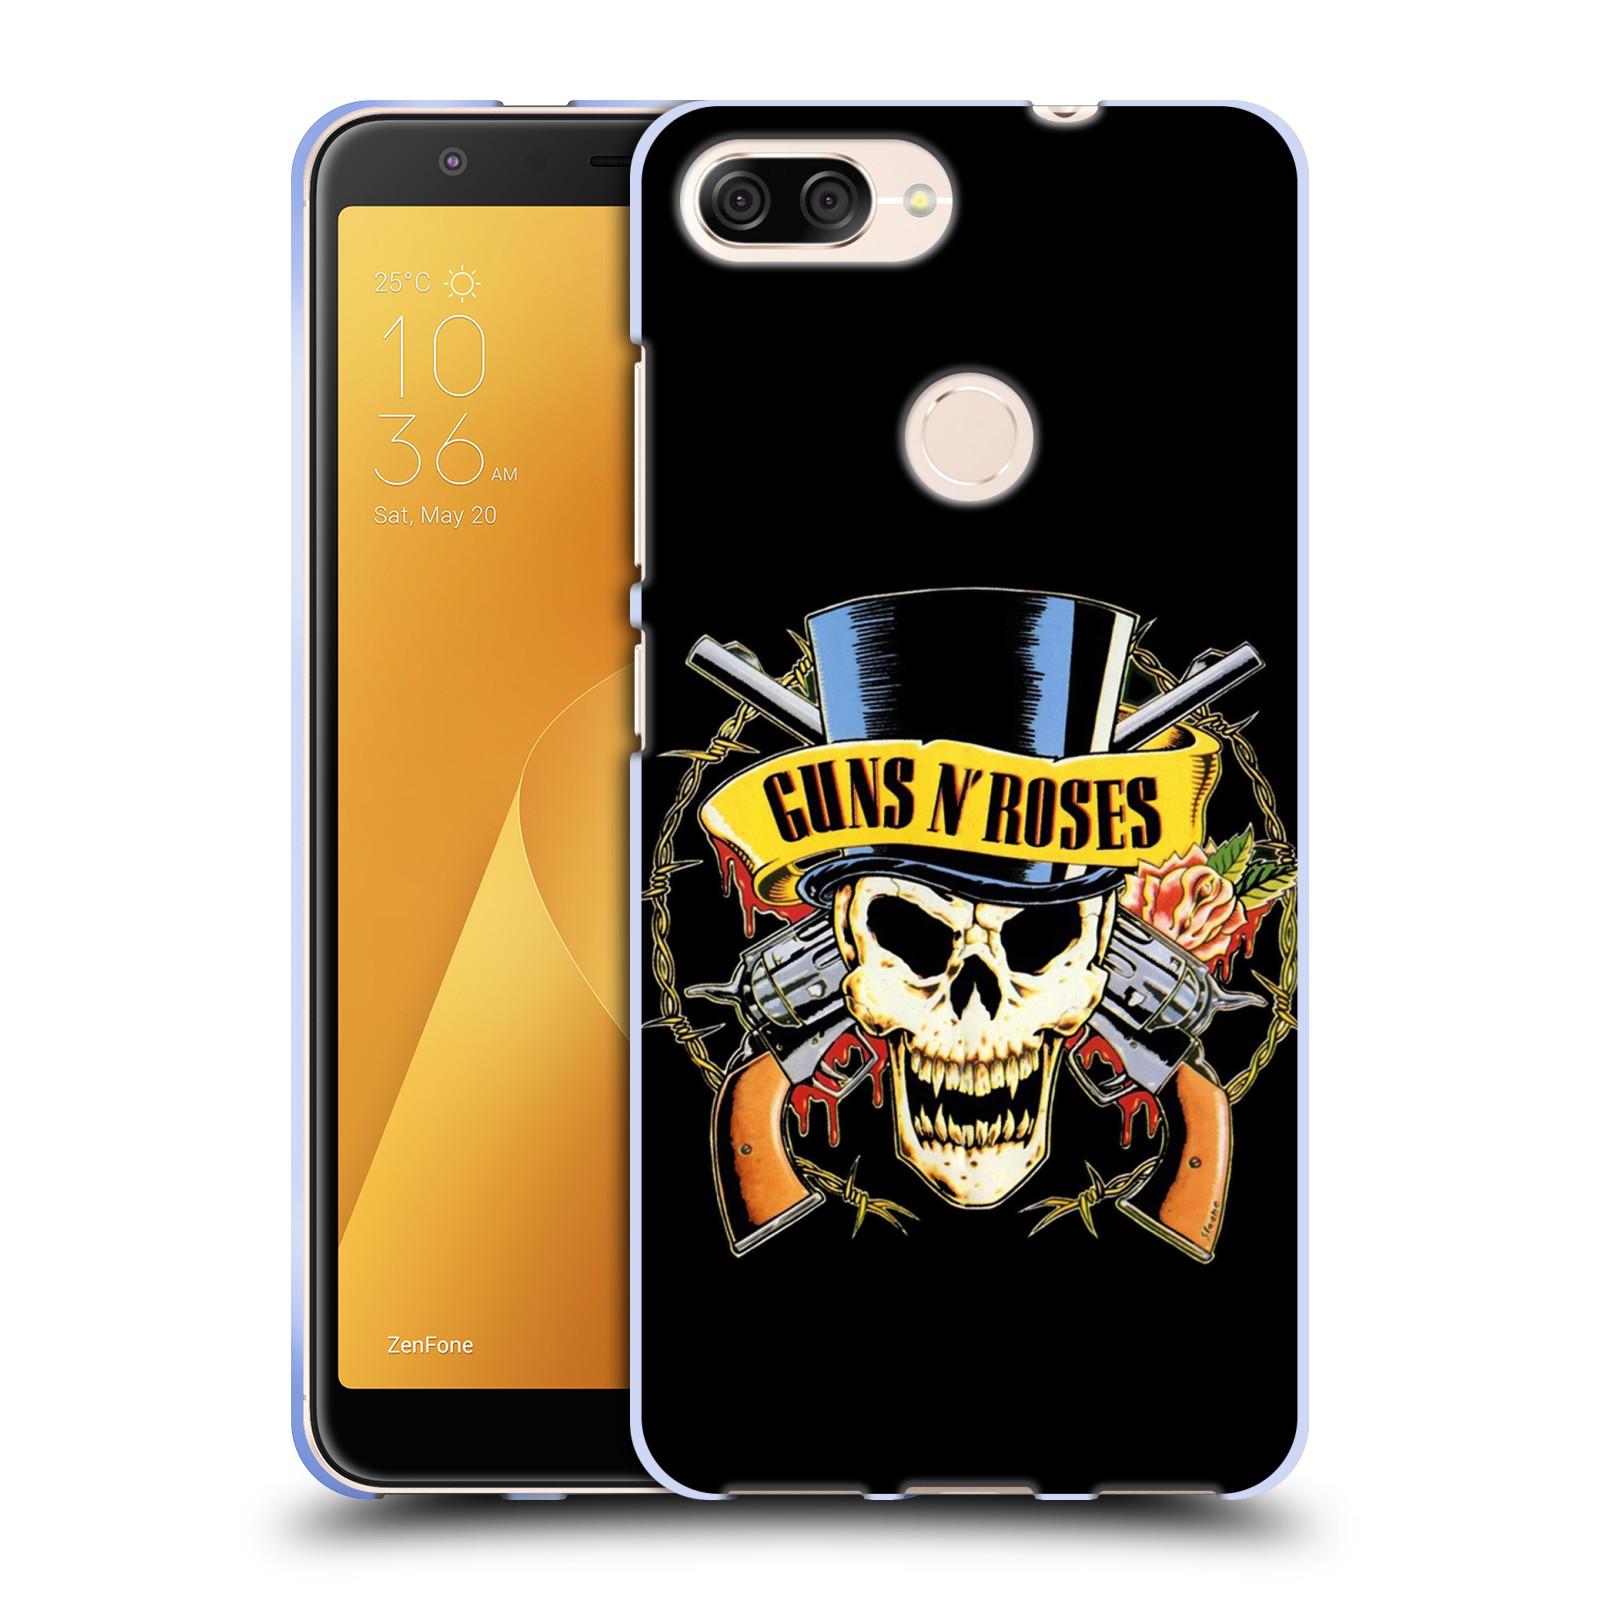 Silikonové pouzdro na mobil Asus ZenFone Max Plus (M1) - Head Case - Guns N' Roses - Lebka